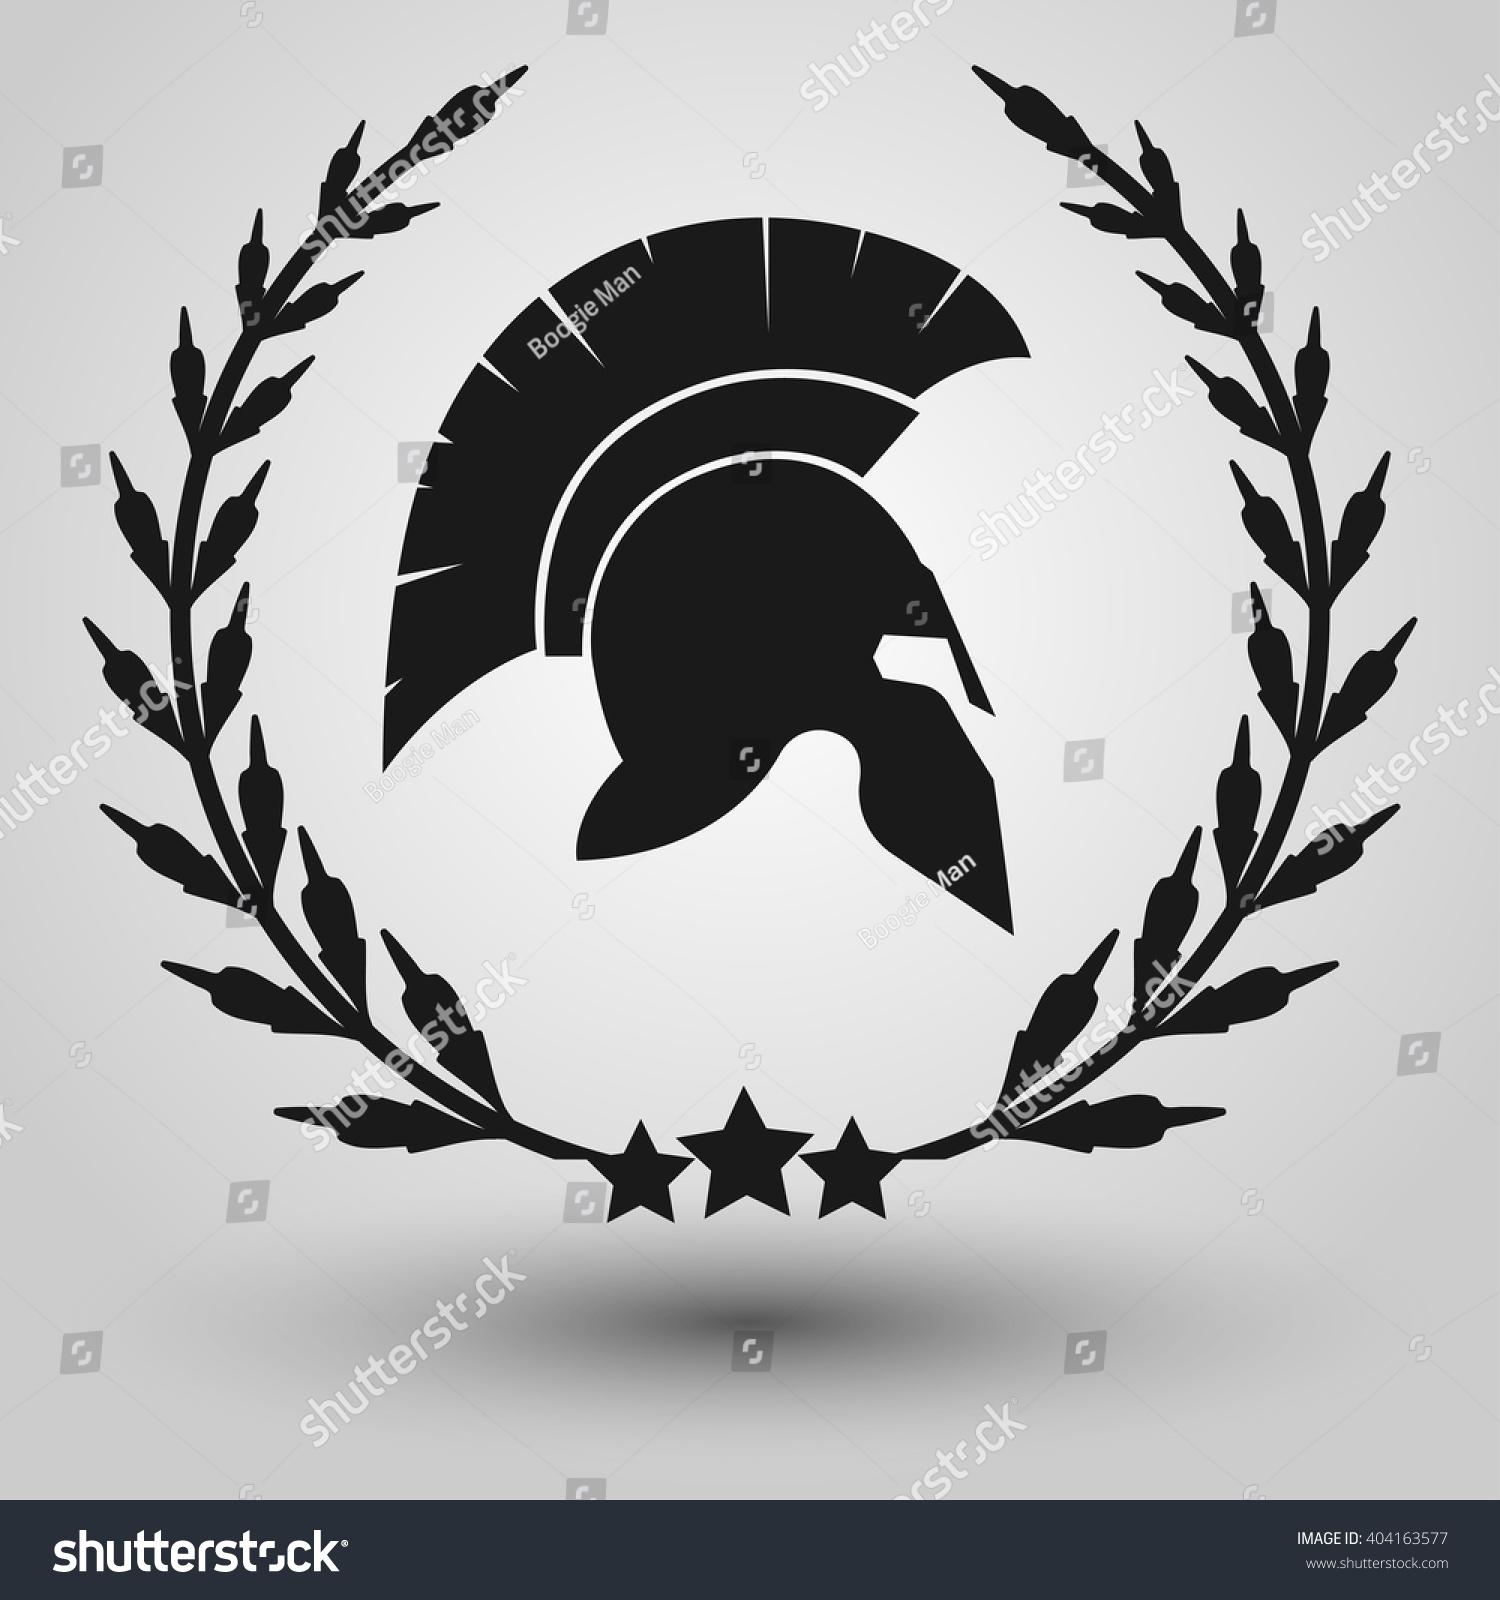 Spartan helmet silhouettes laurel wreath symbol stock vector spartan helmet silhouettes with laurel wreath symbol of gladiator soldier or greek warrior or roman biocorpaavc